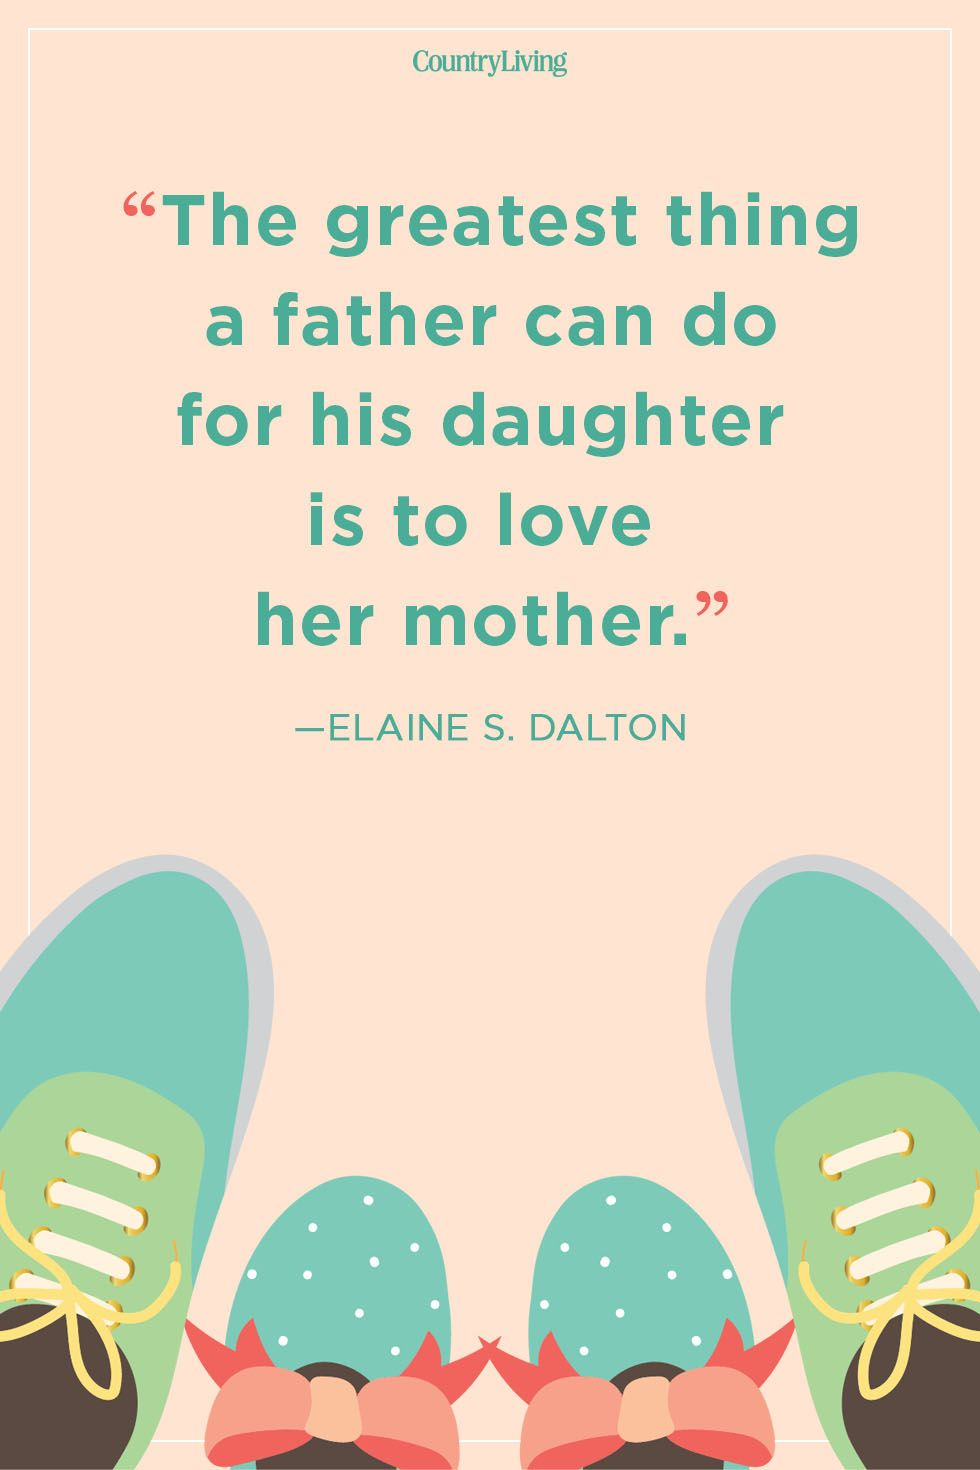 Elaine S. Daltonfather daughter quote